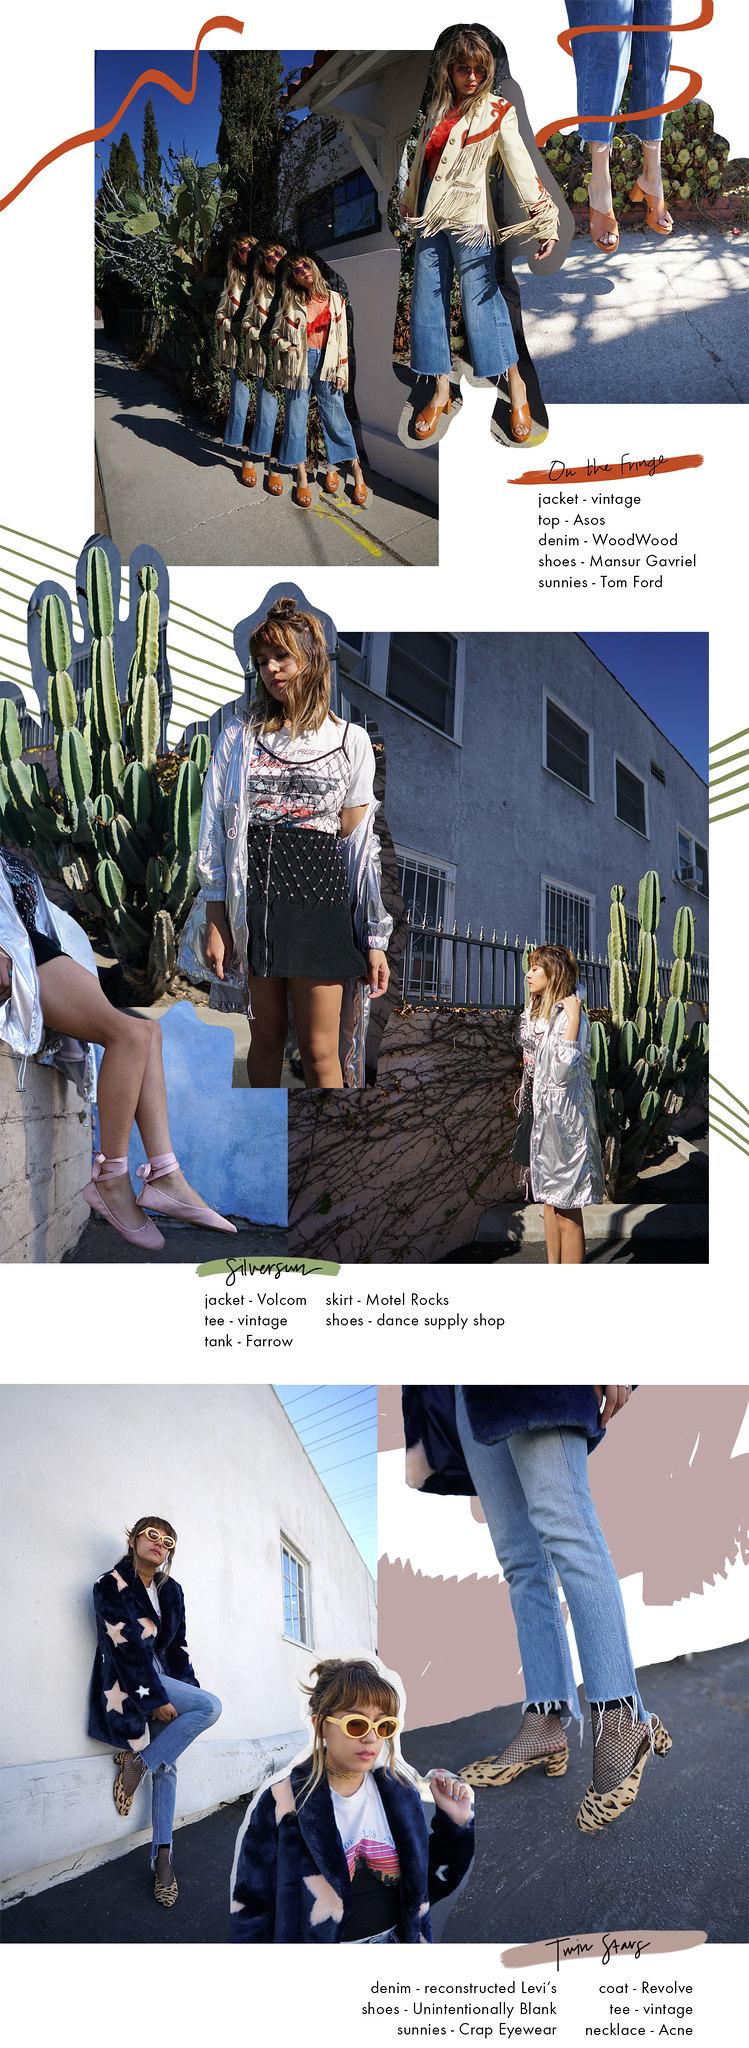 Outerwear Lookbook post